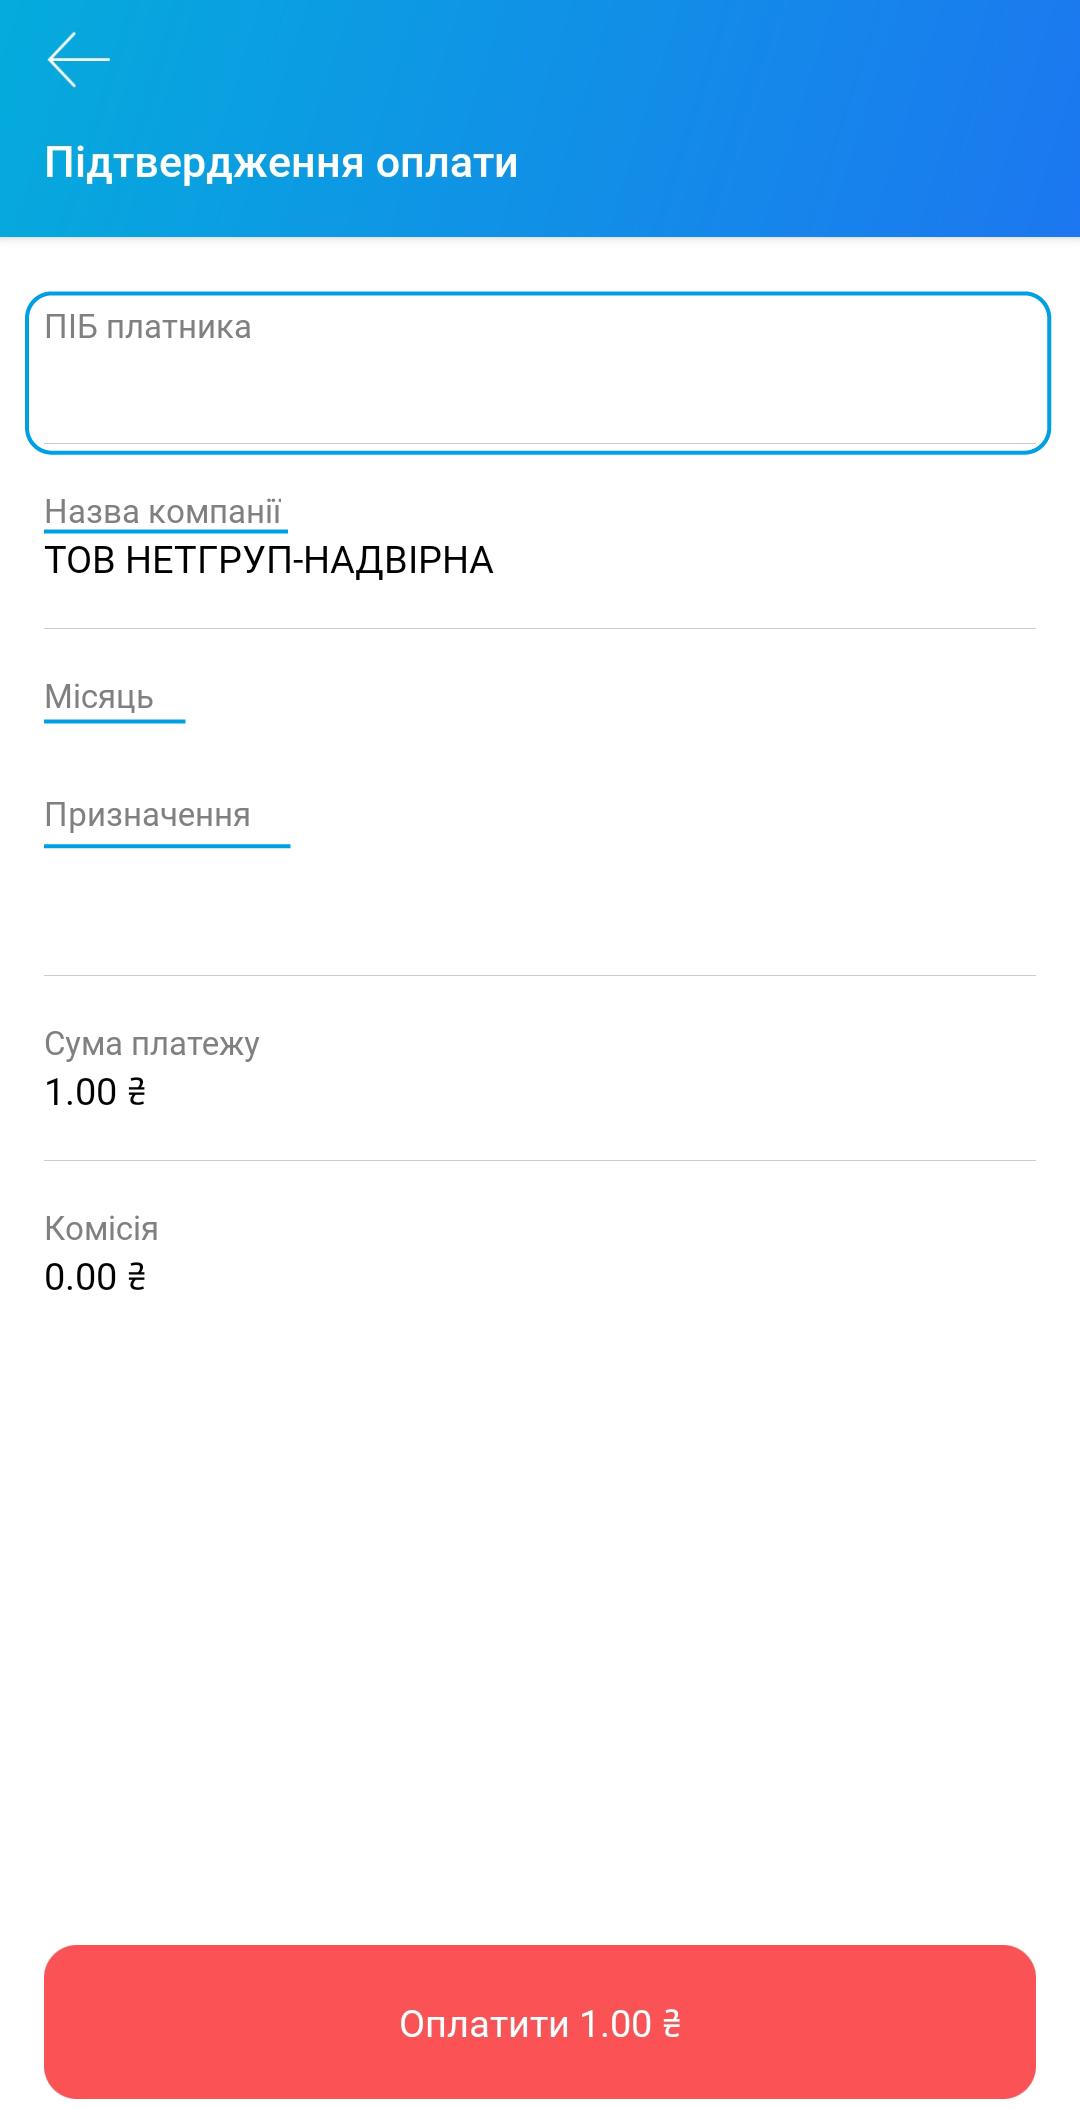 оплата онлайн | monobank | netgroup